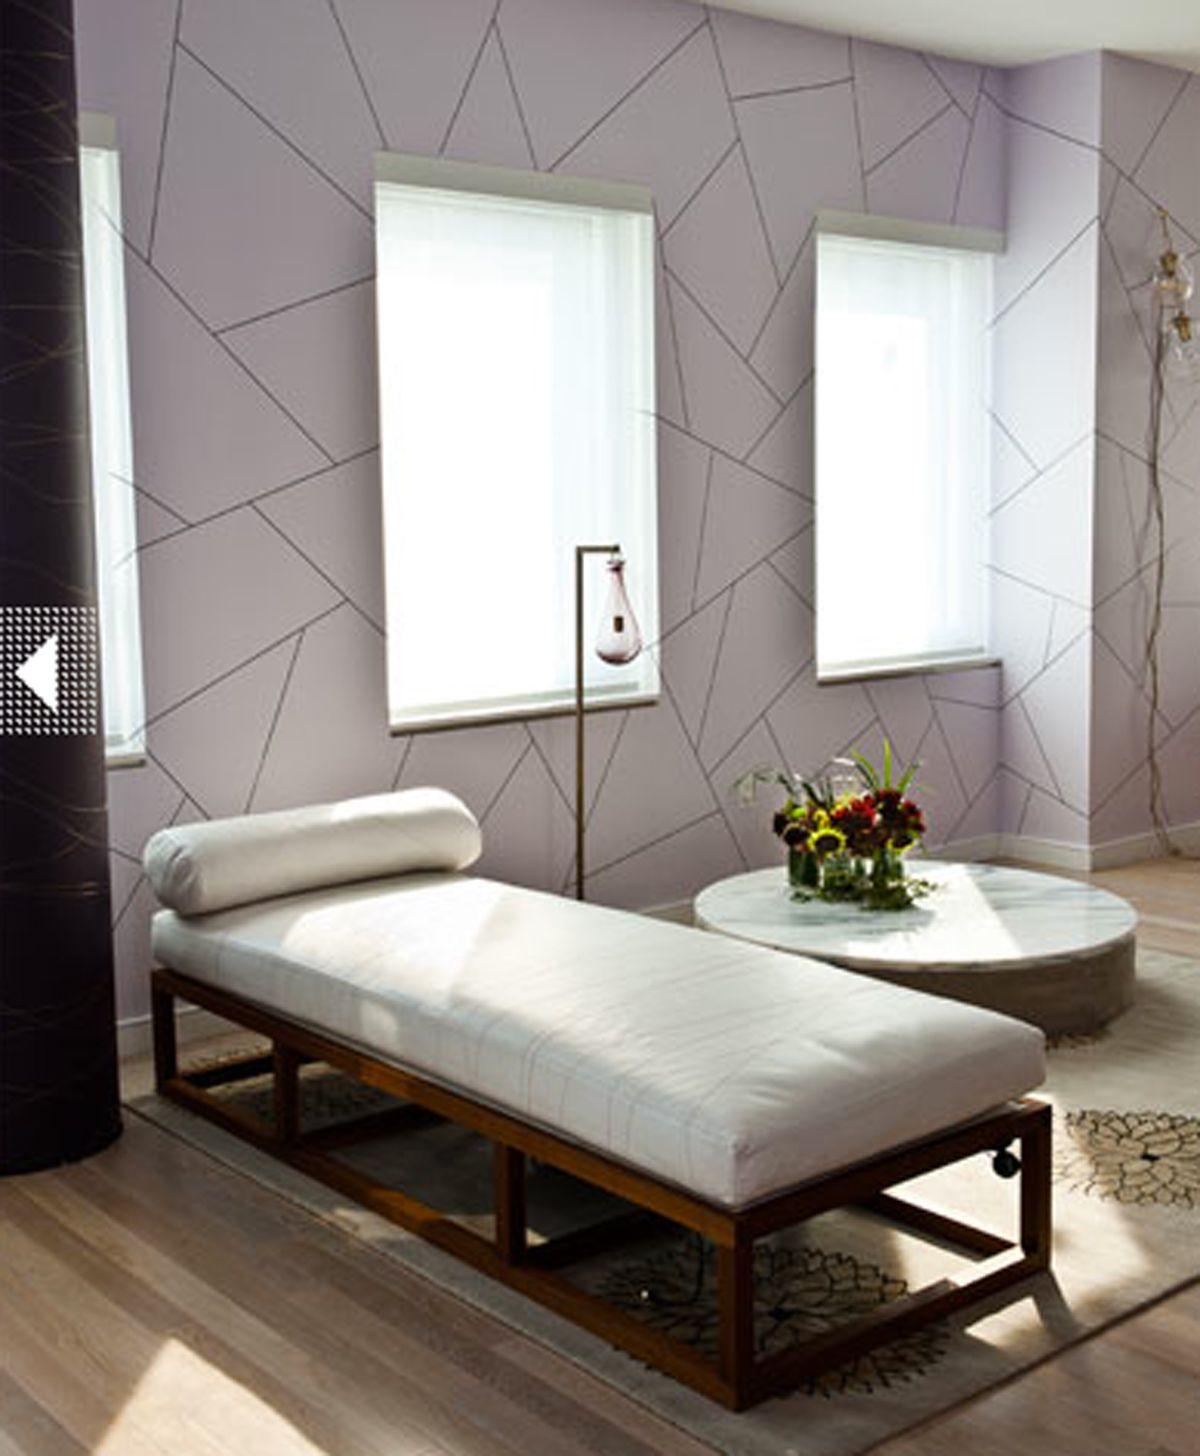 Simple interior decorating ideas - 1000 Images About Propertitua